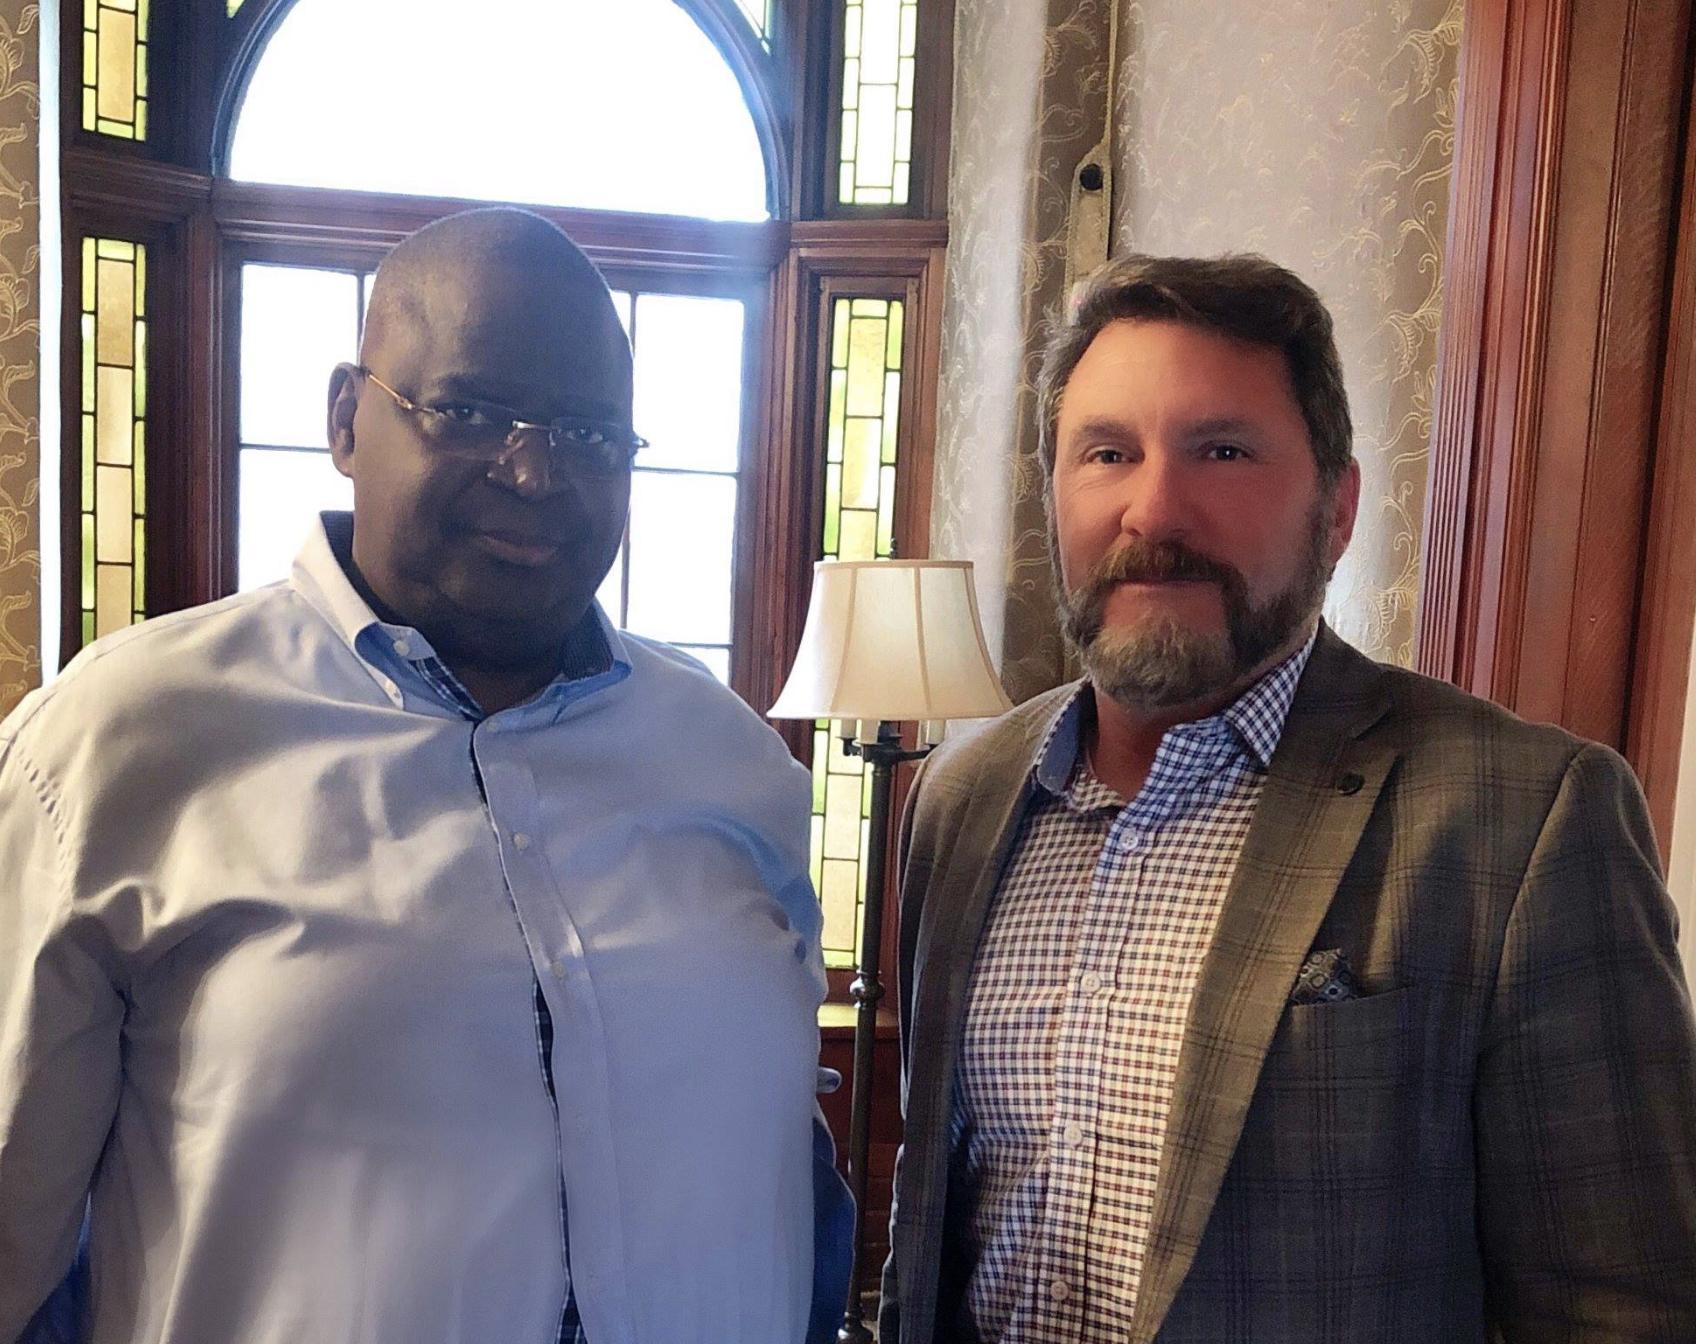 In Washington D.C. with H.E. Ambassador Serge Mombouli, of the Republic of the Congo